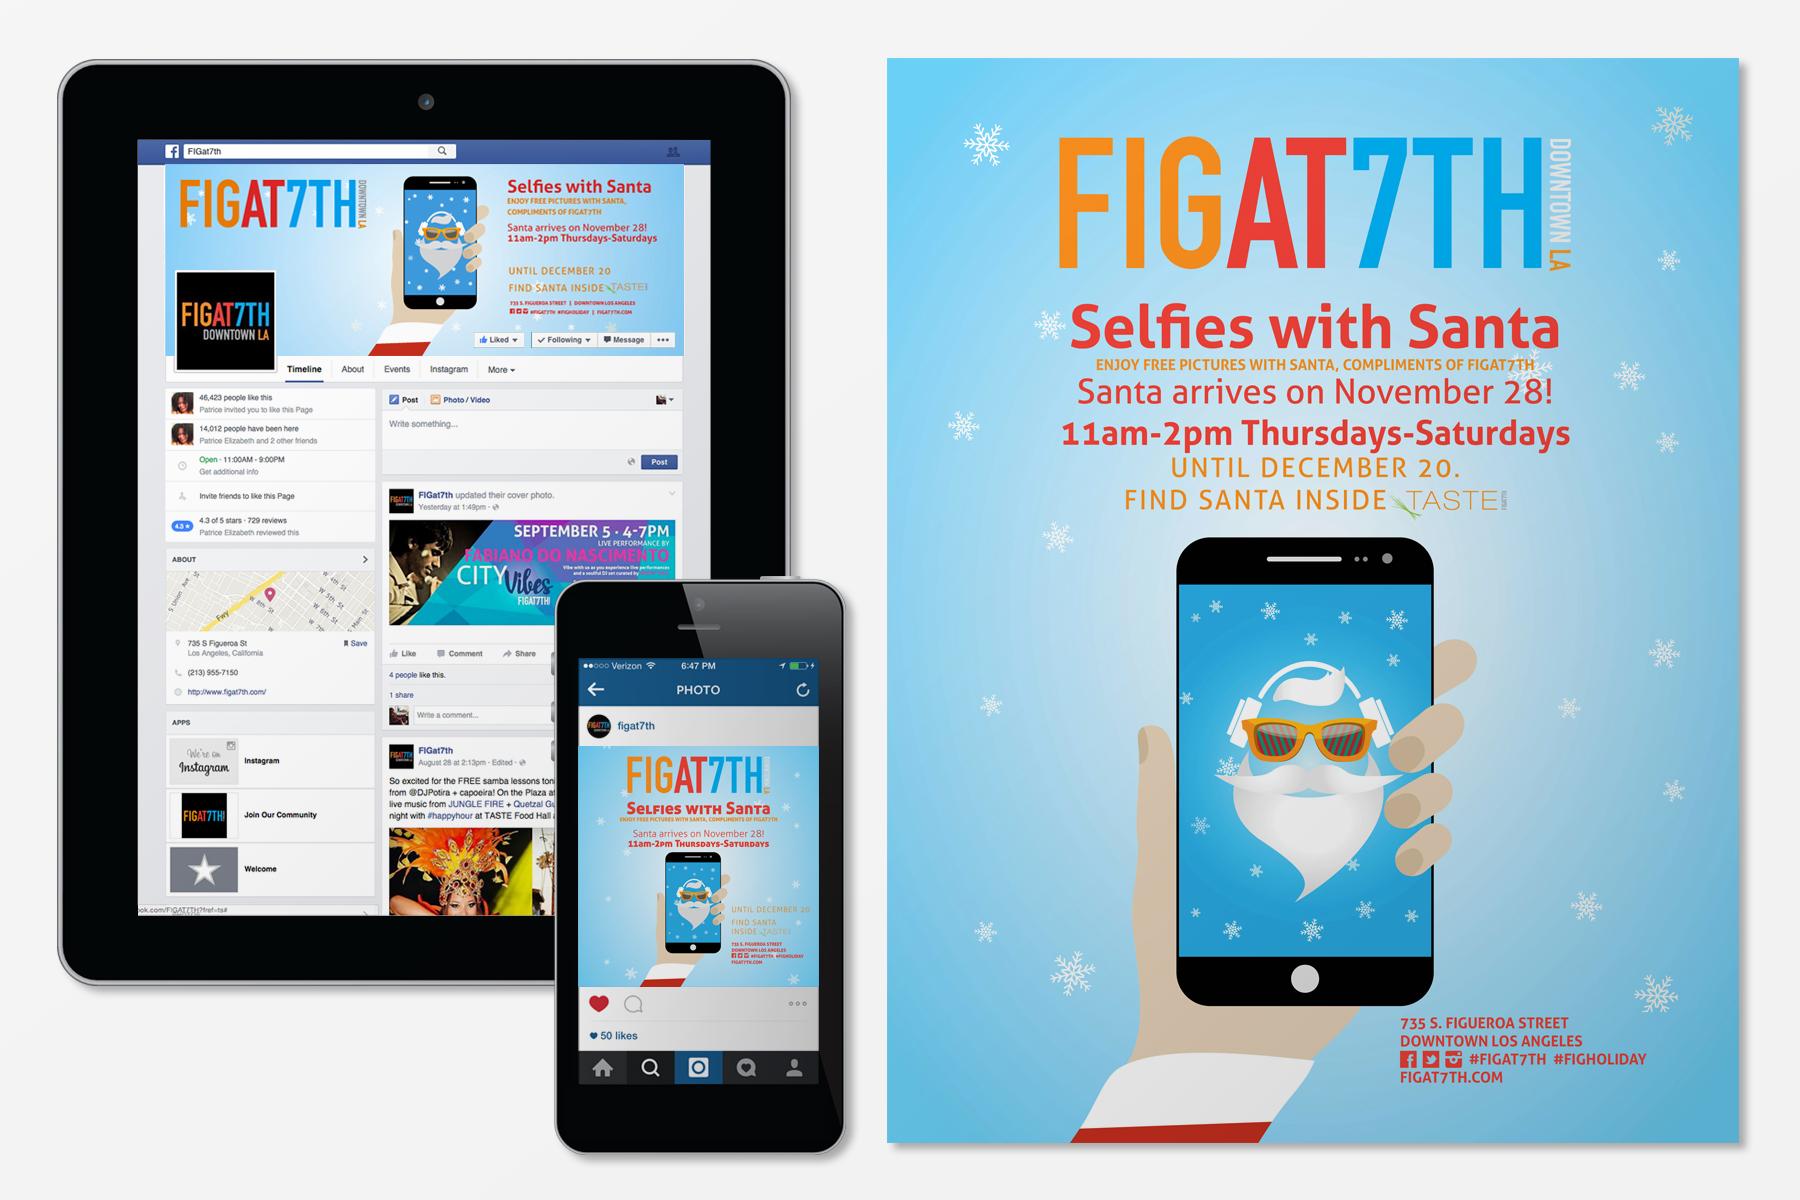 FigAt7th-Santa_web1.jpg